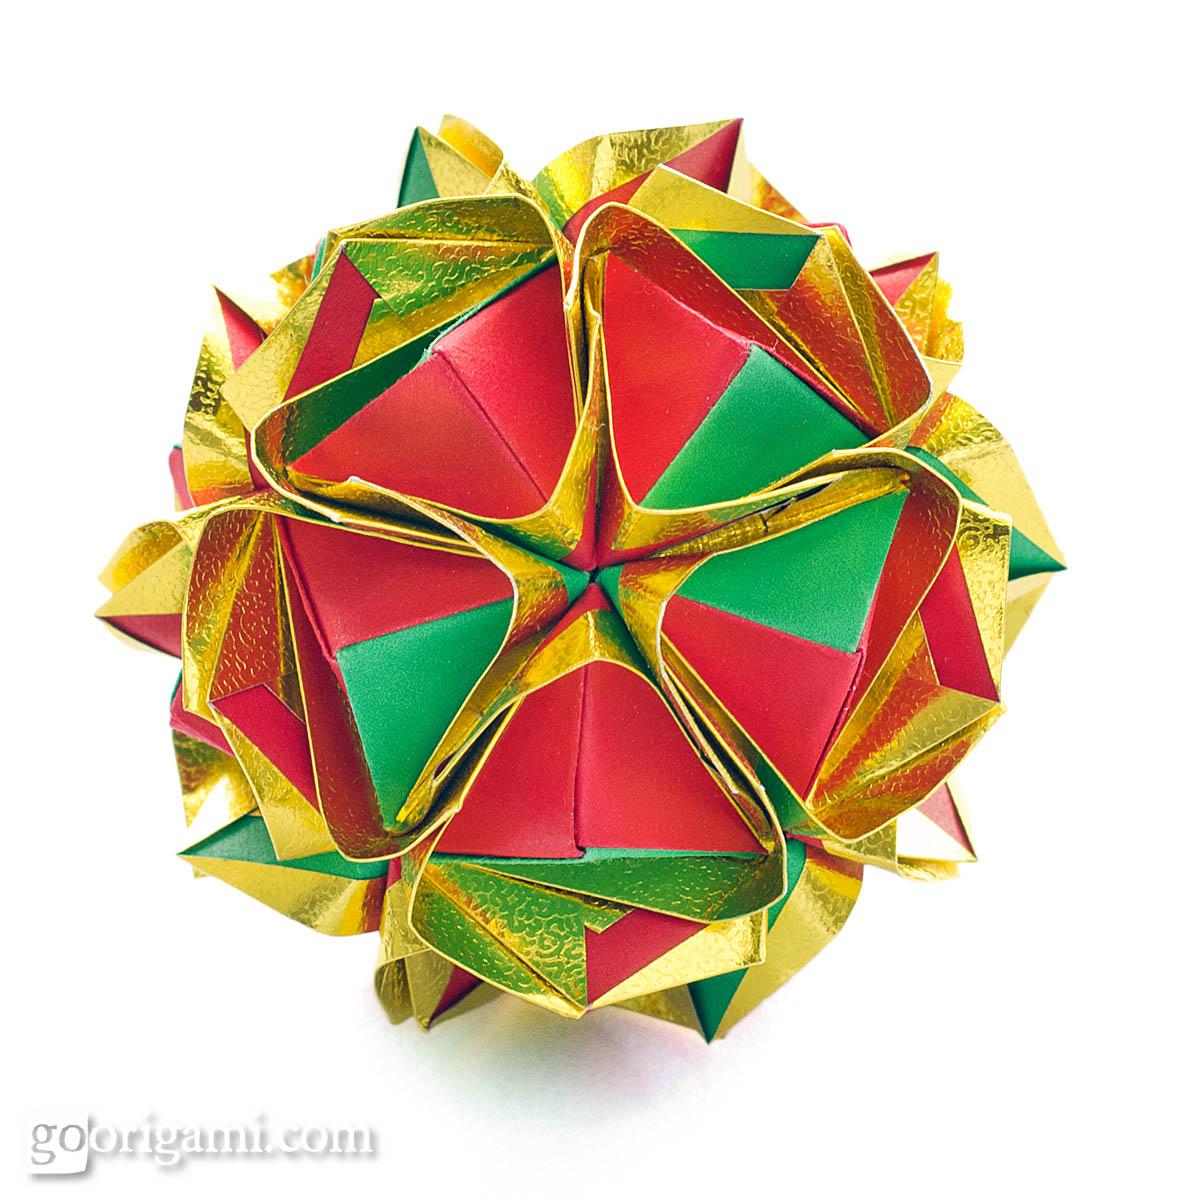 soccer ball modular origami diagram of kidney ureter and bladder clover kusudama by maria sinayskaya  go